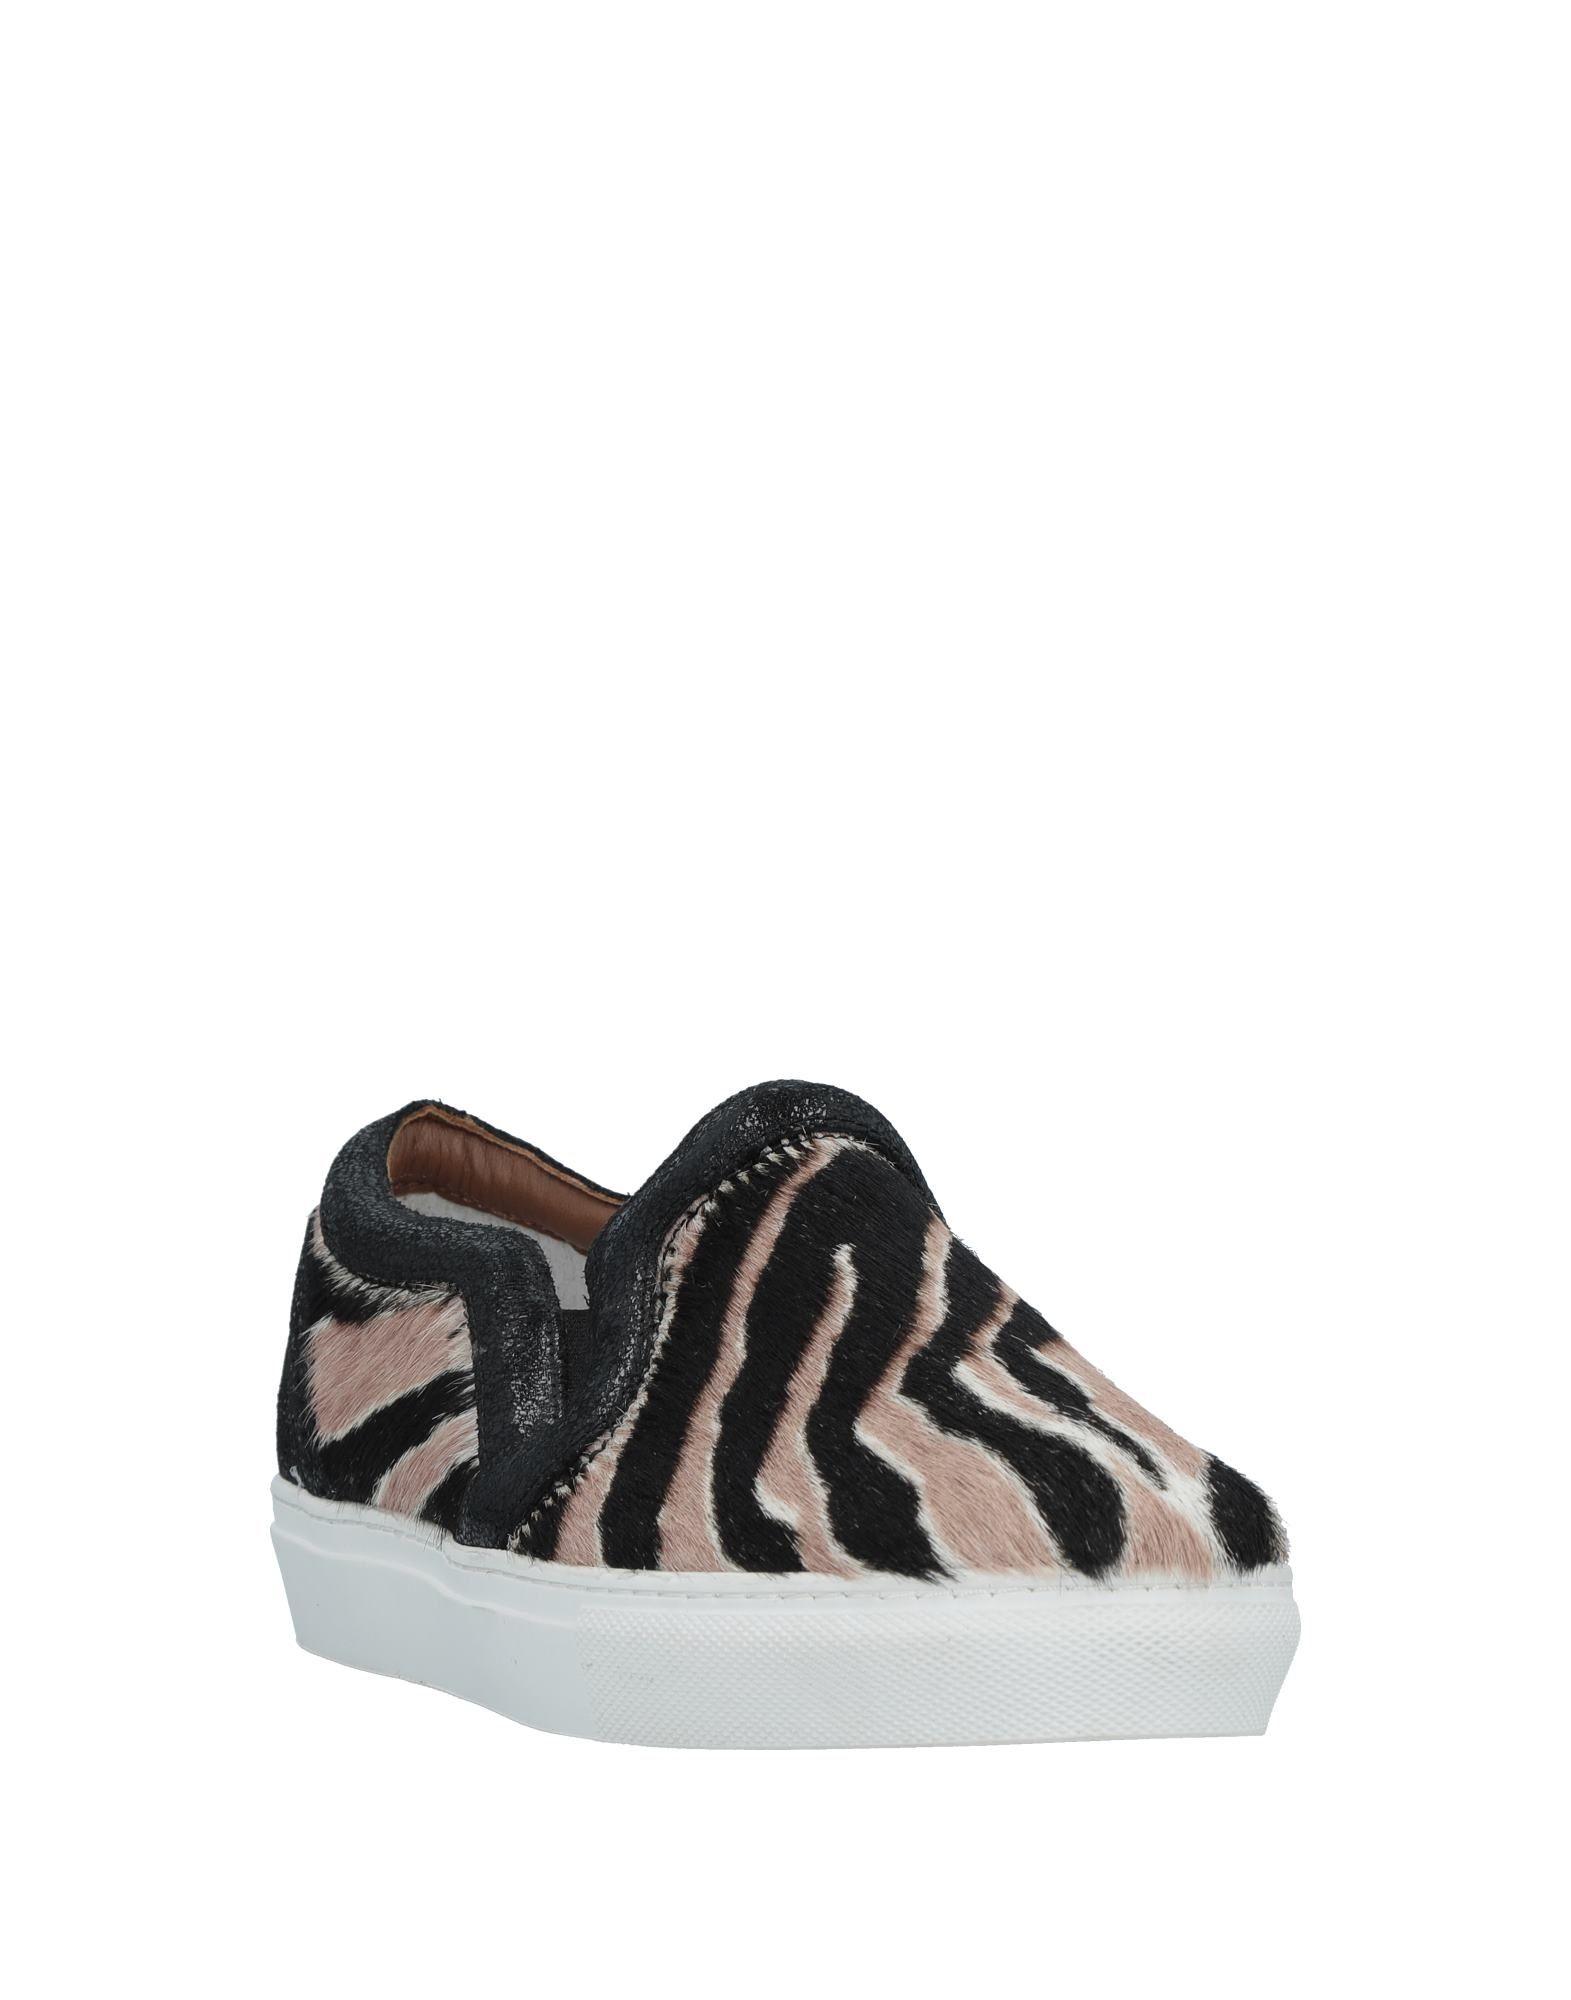 Ishikawa Sneakers Damen  Schuhe 11523618FC Gute Qualität beliebte Schuhe  387f6c